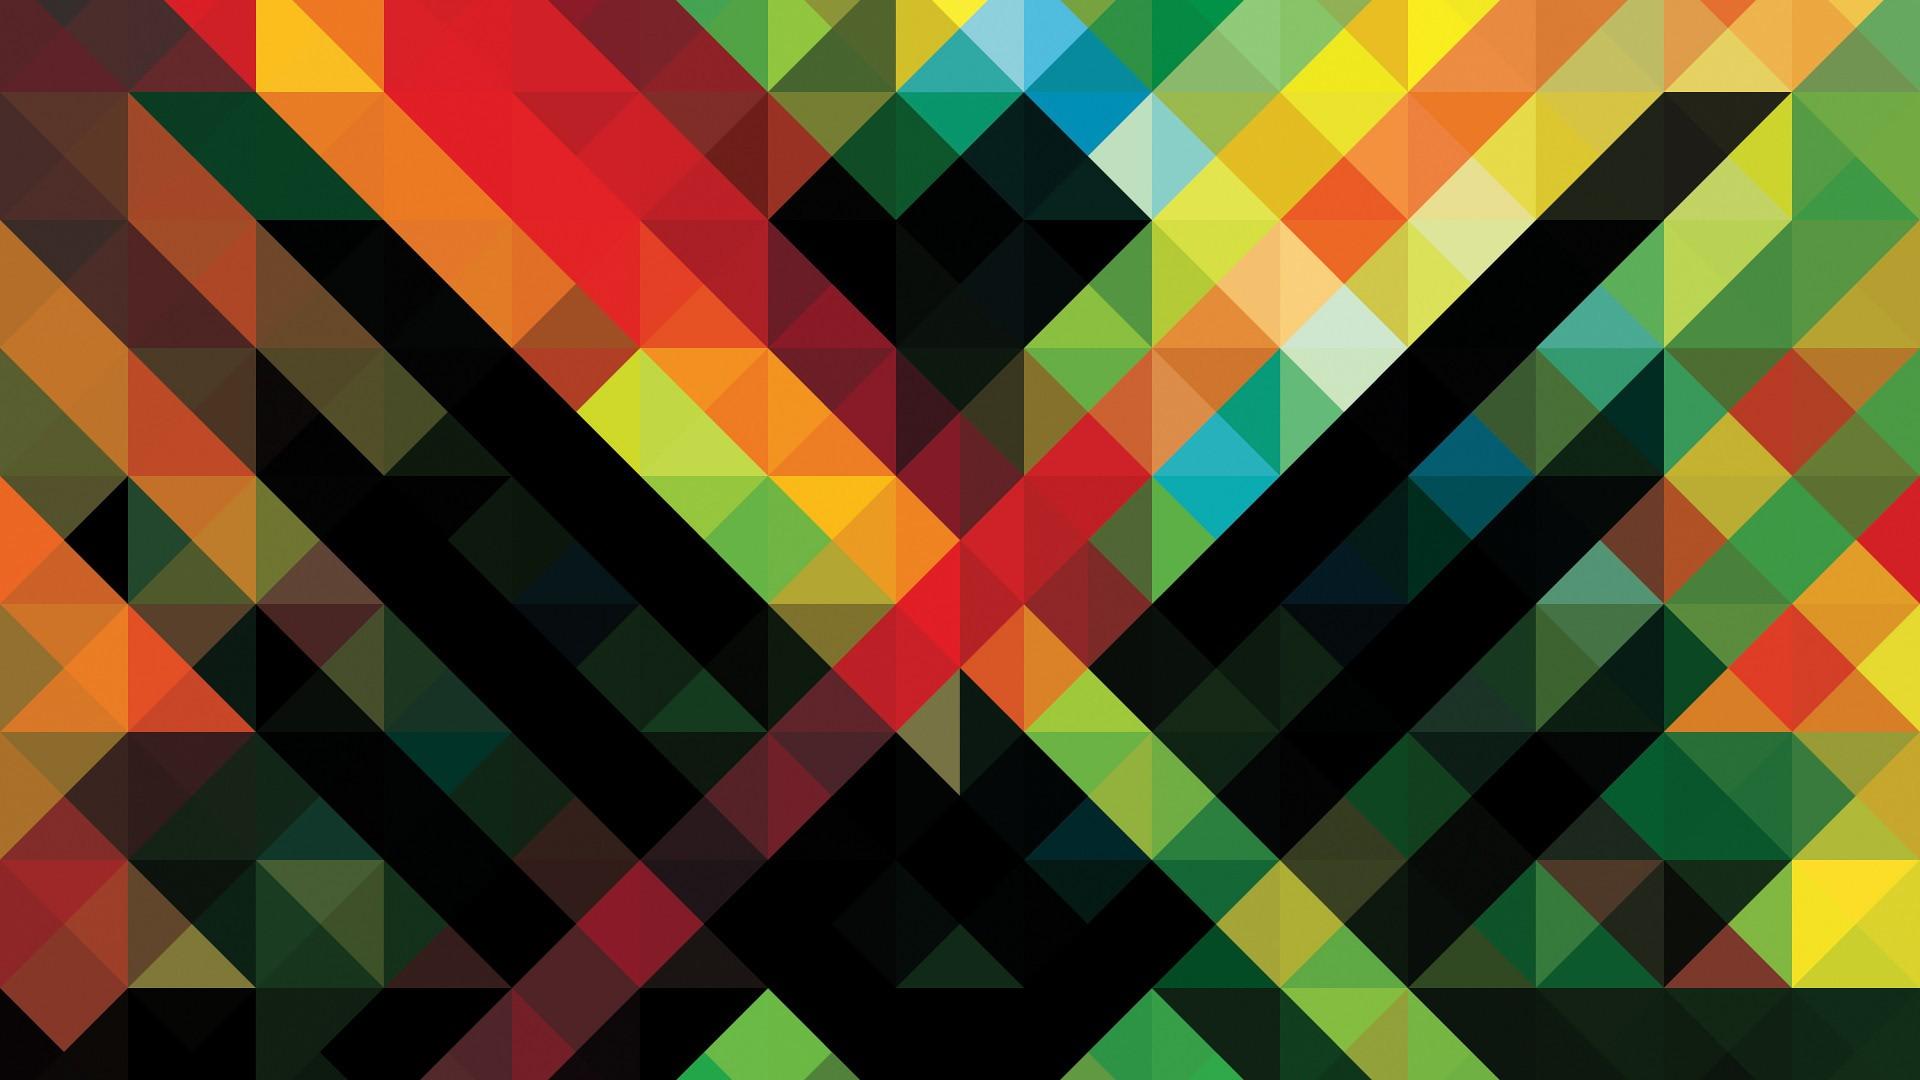 Colorful pattern full hd desktop wallpapers 1080p - Hd pattern wallpapers 1080p ...